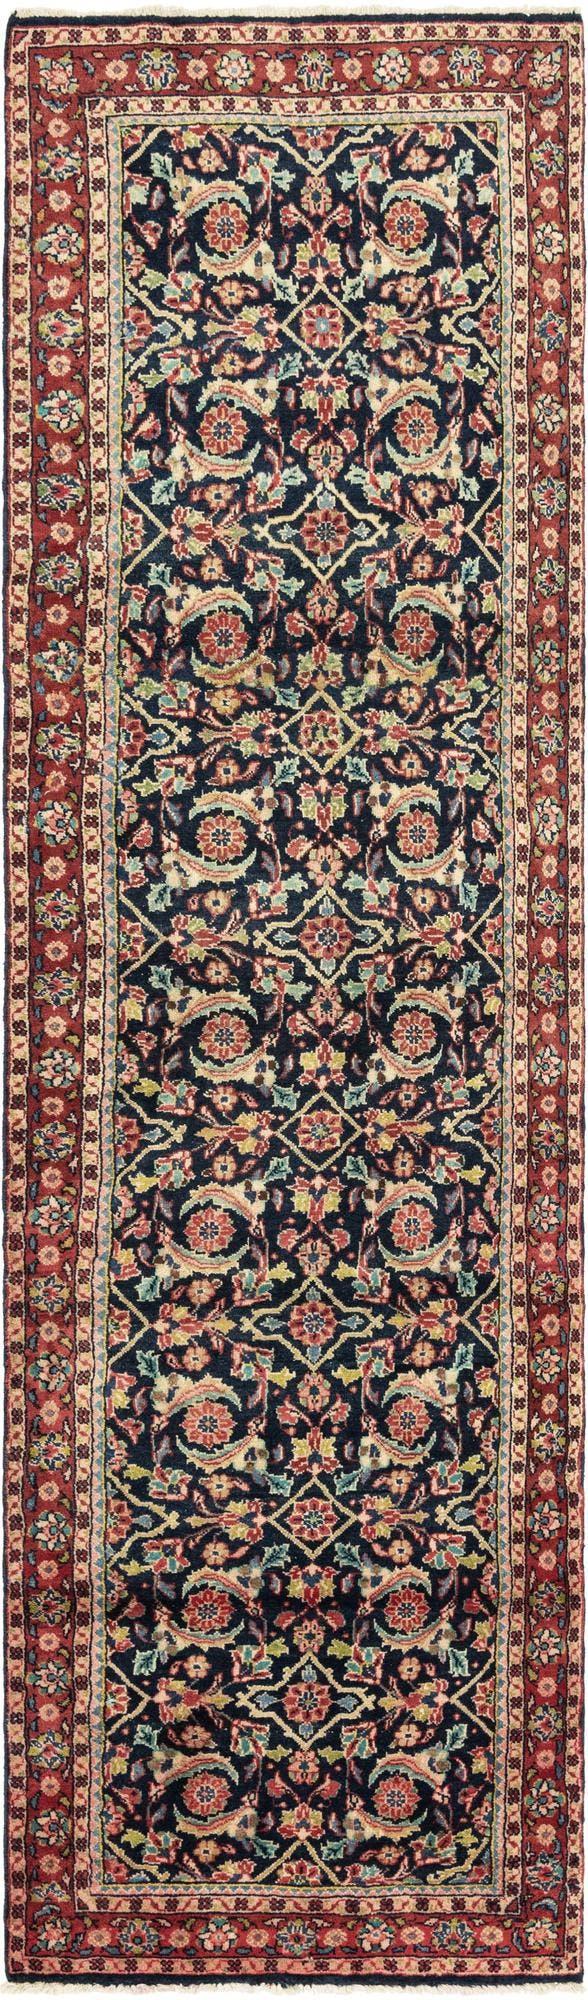 3' 5 x 13' 6 Meshkabad Persian Runner Rug main image